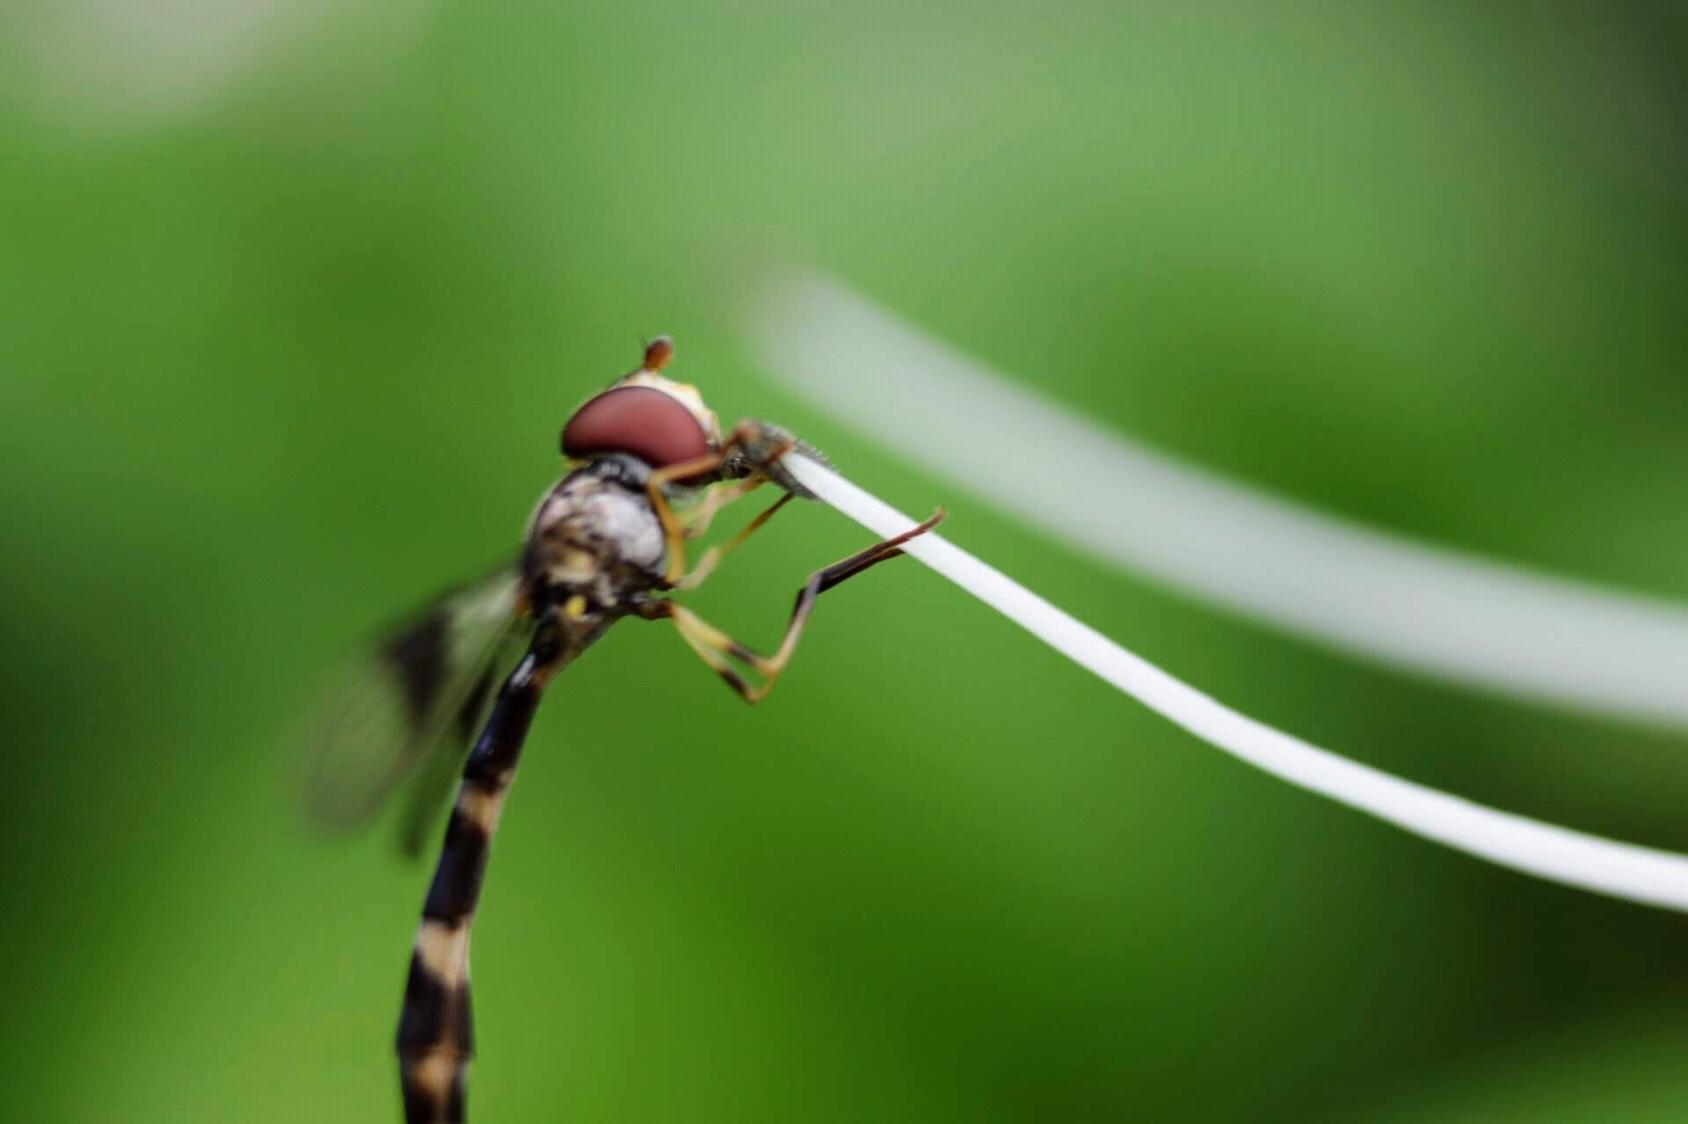 Dragonfly wasp